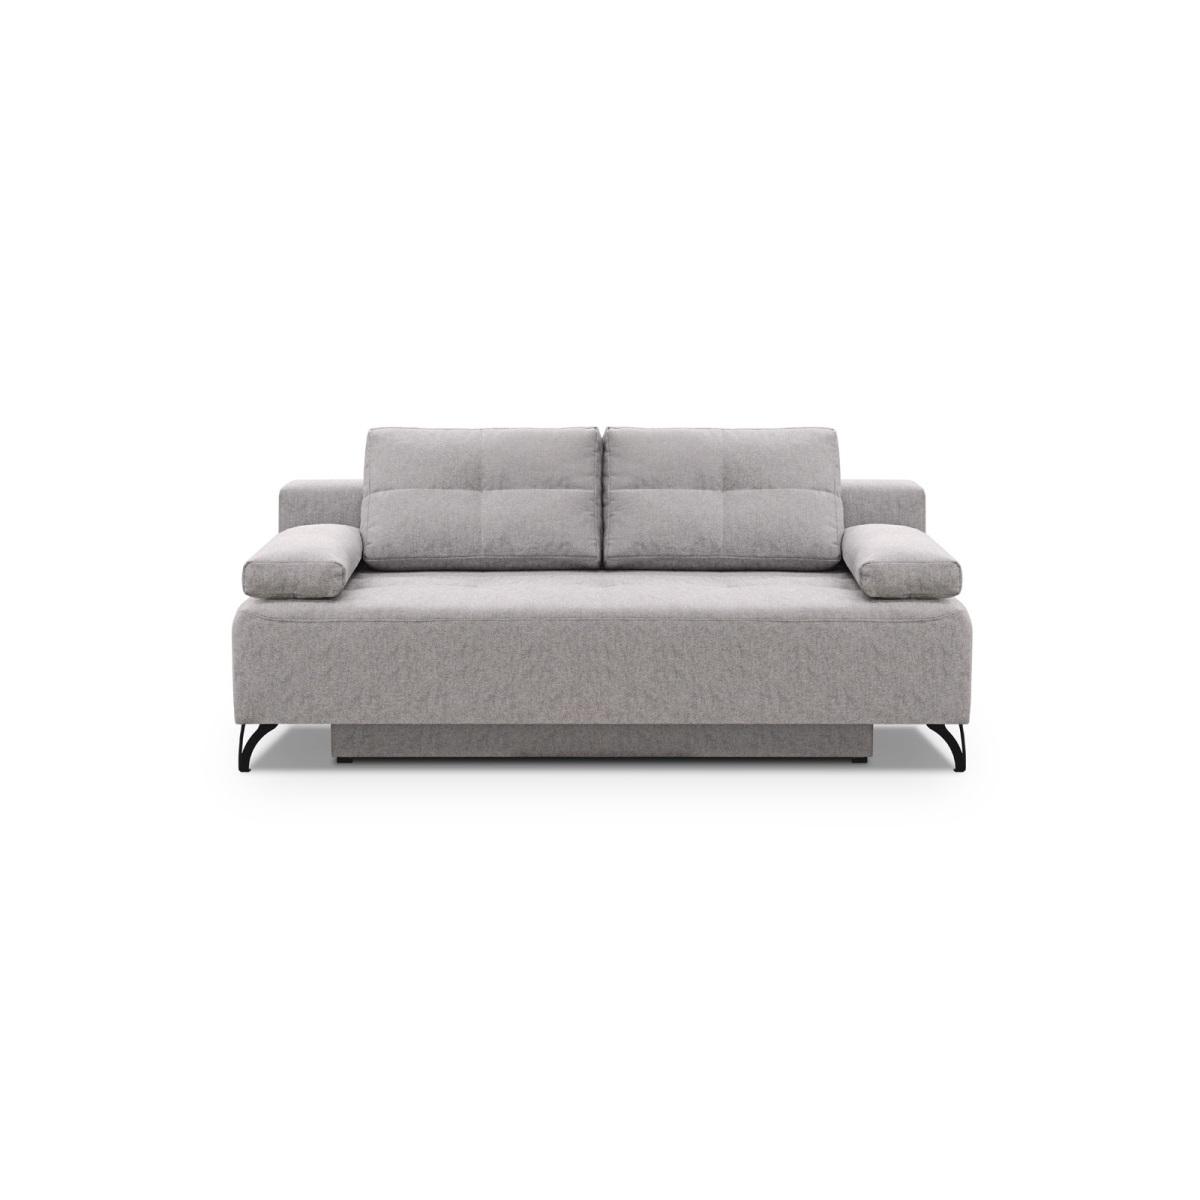 Full Size of 2 Sitzer Sofa Mit Schlaffunktion Casavanti Pure 150 2020 Cm Ikea Kiefer Bett 90x200 Xxl Grau Günstig 140x200 Stauraum Halbrundes Le Corbusier Rauch Betten Sofa 2 Sitzer Sofa Mit Schlaffunktion